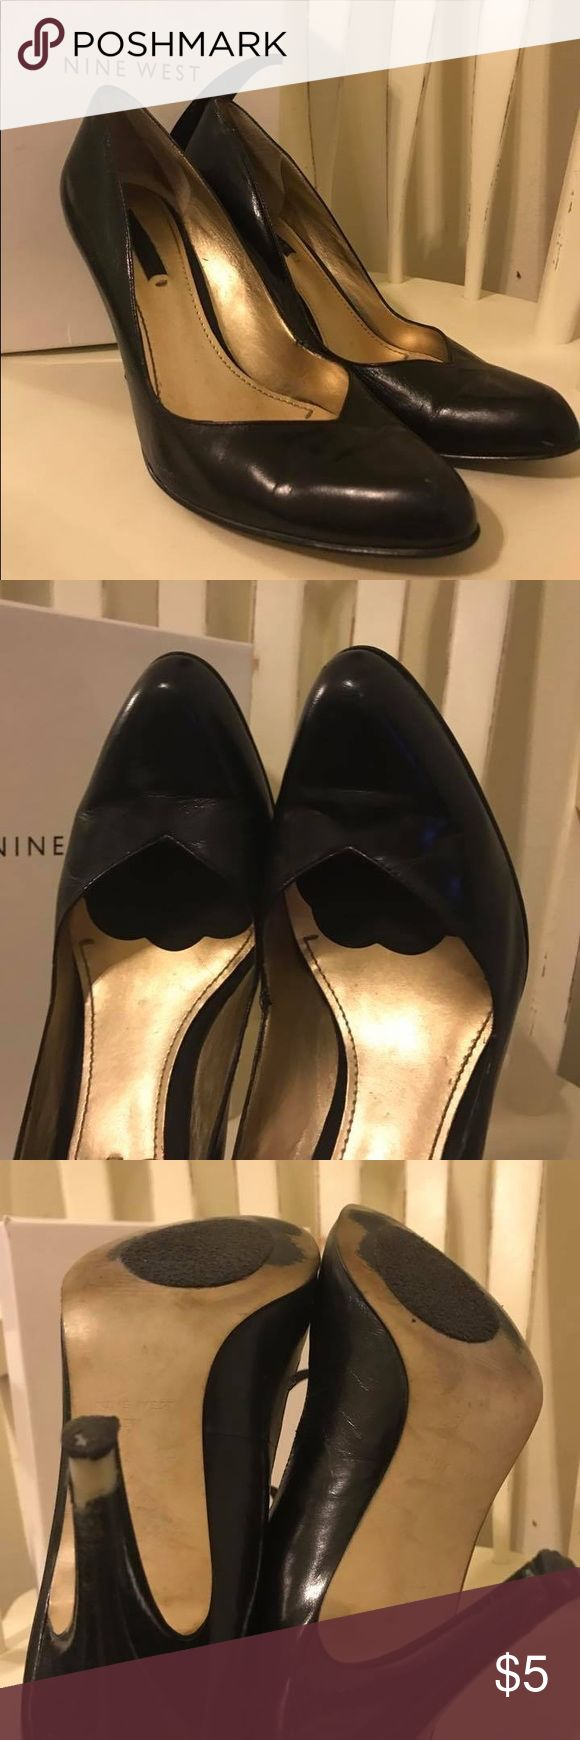 Nine West Heels Used size 9 Nine West Heels Used size 9 Nine West Shoes Heels